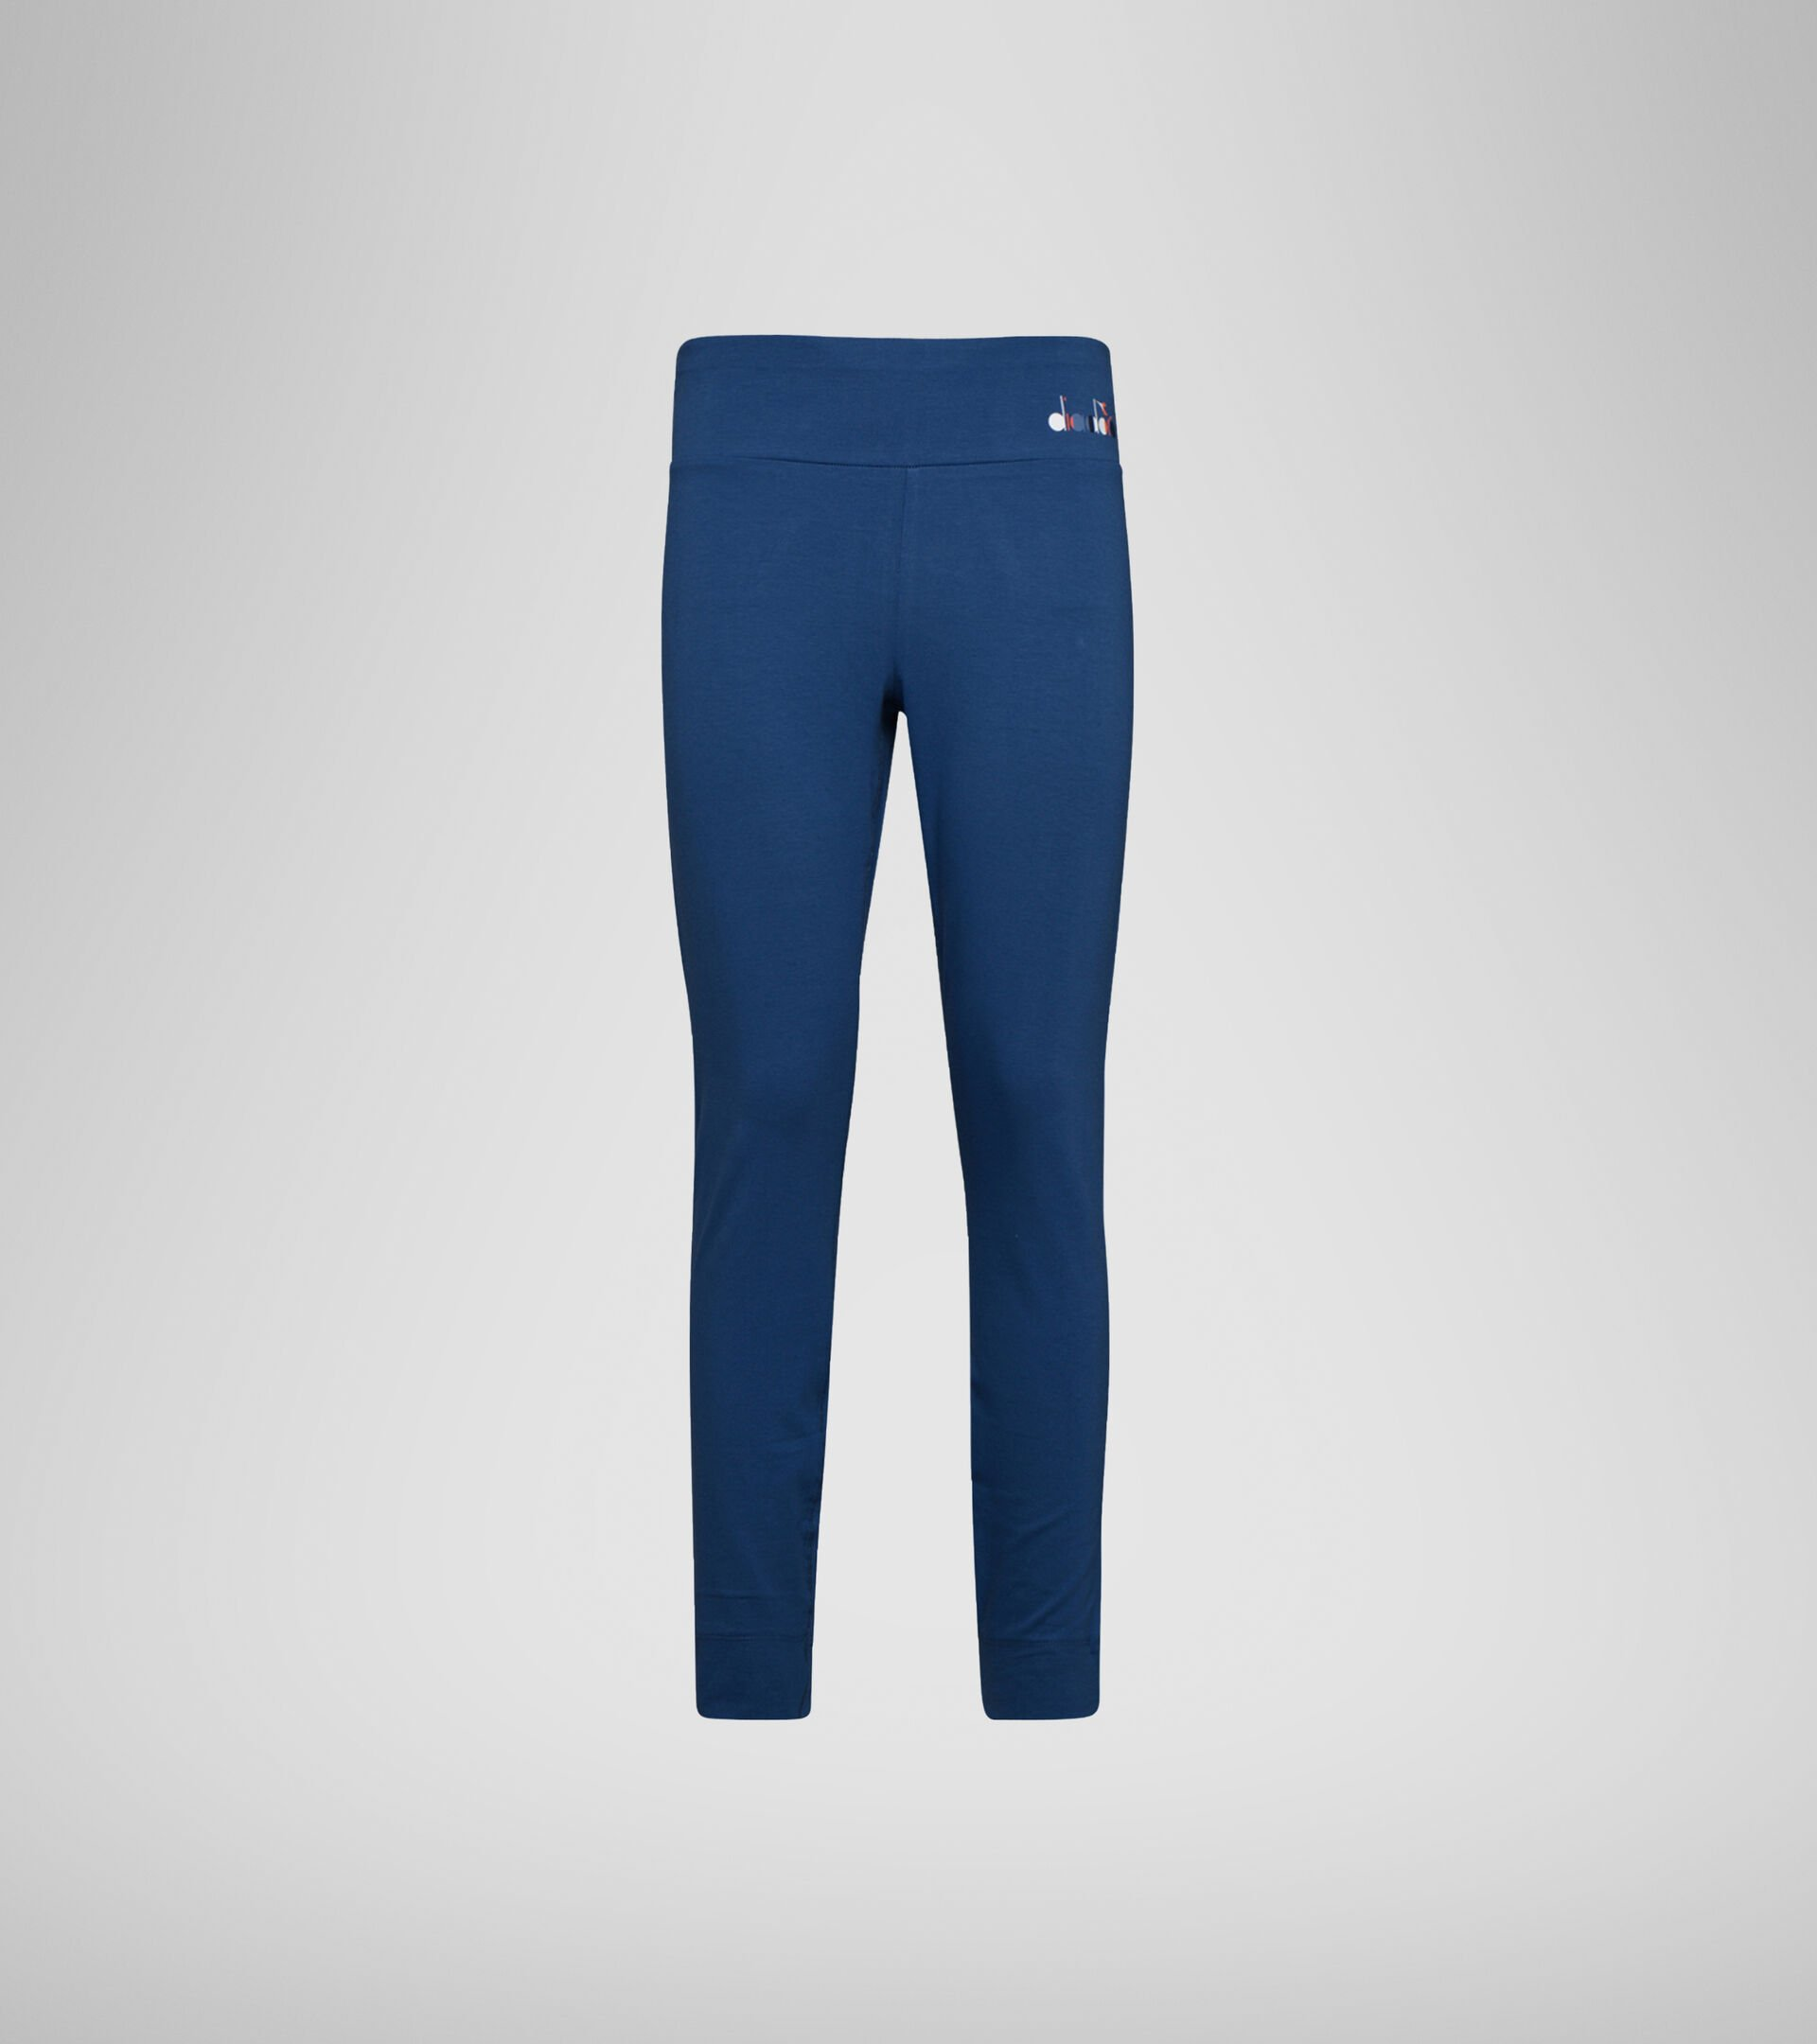 Leggings - Women L.LEGGINGS SPOTLIGHT ENSIGN BLUE - Diadora